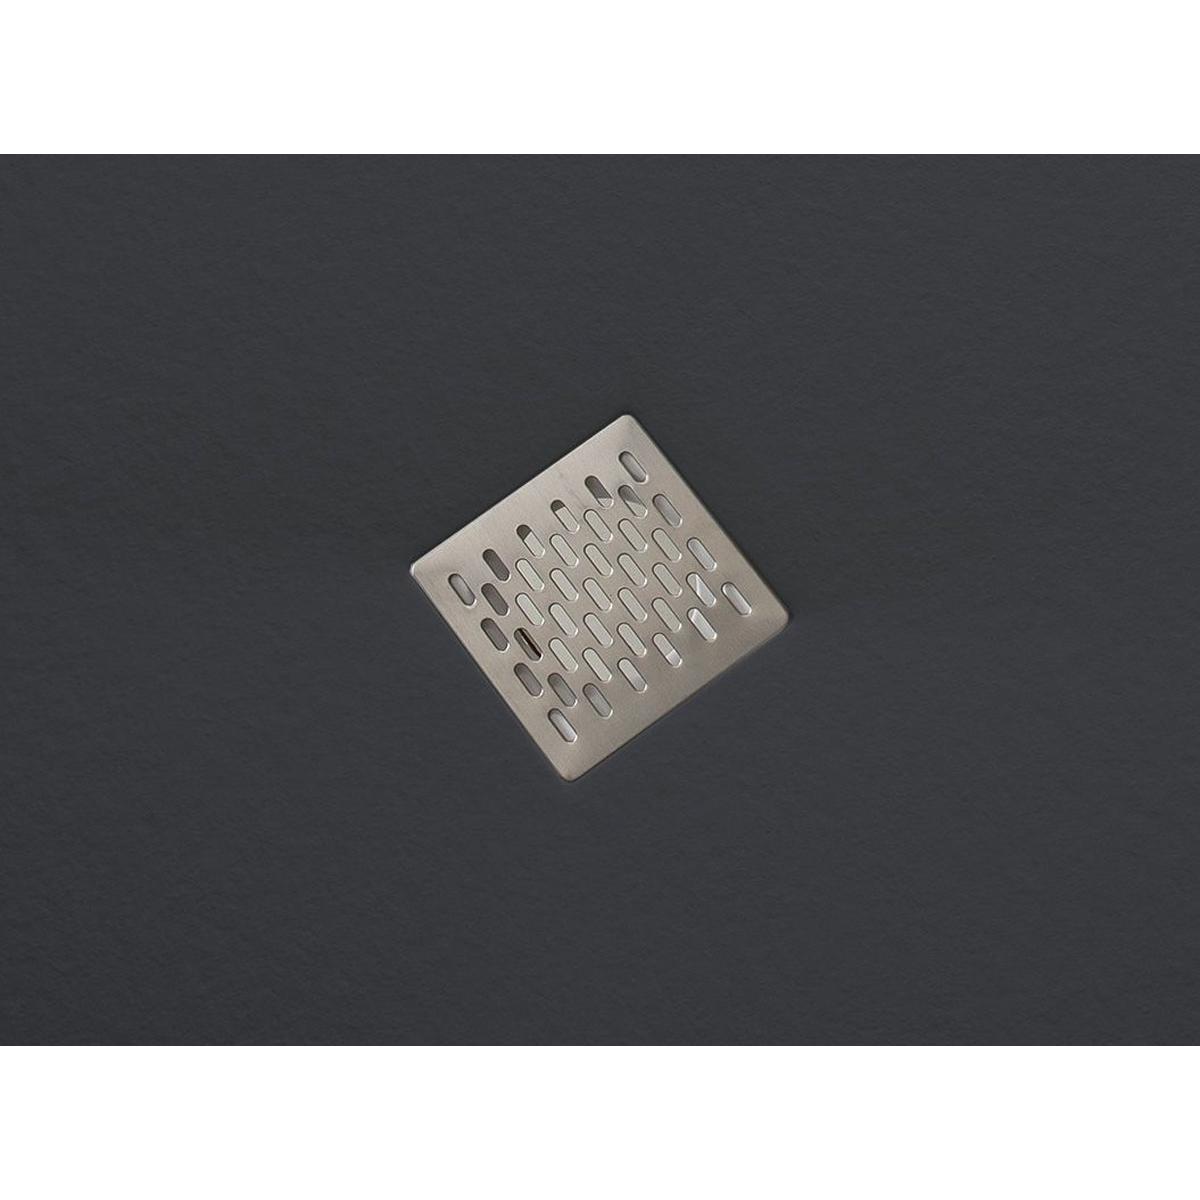 Plato de ducha rectangular 100x80 Coliseo Stone Nox Grafito